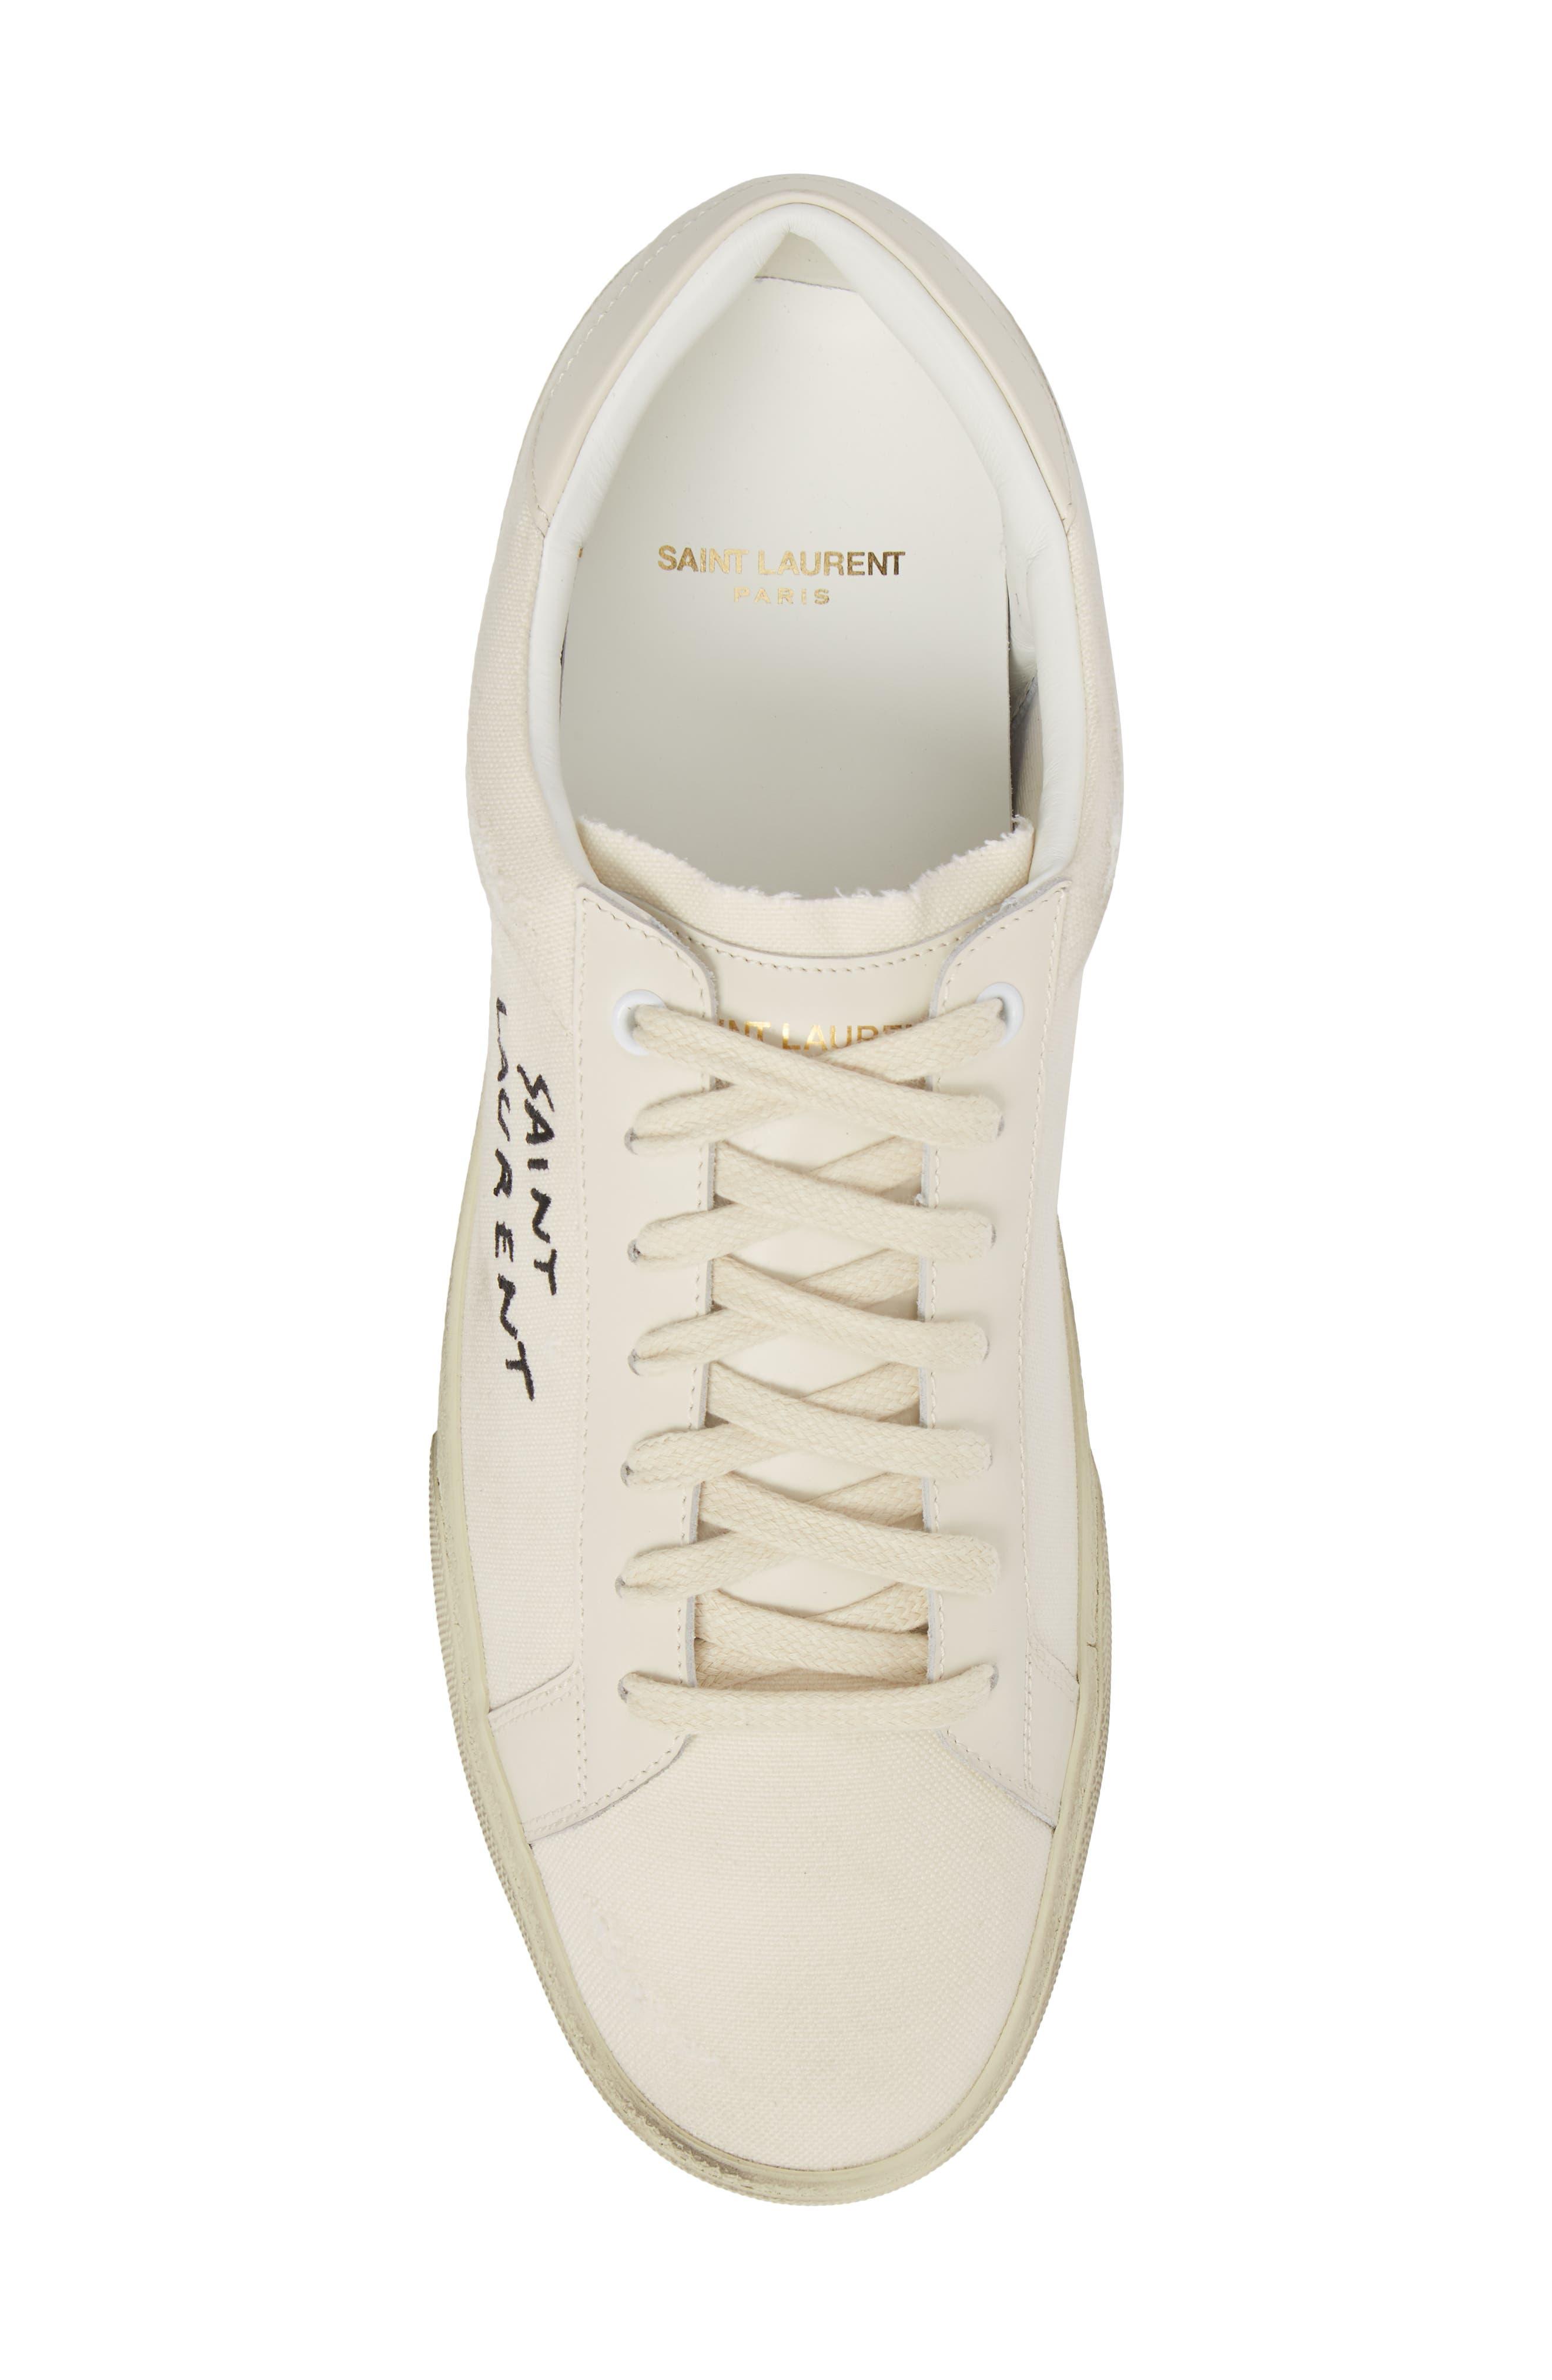 SAINT LAURENT, Logo Embroidered Sneaker, Alternate thumbnail 5, color, 9113 PANNA/PANNA